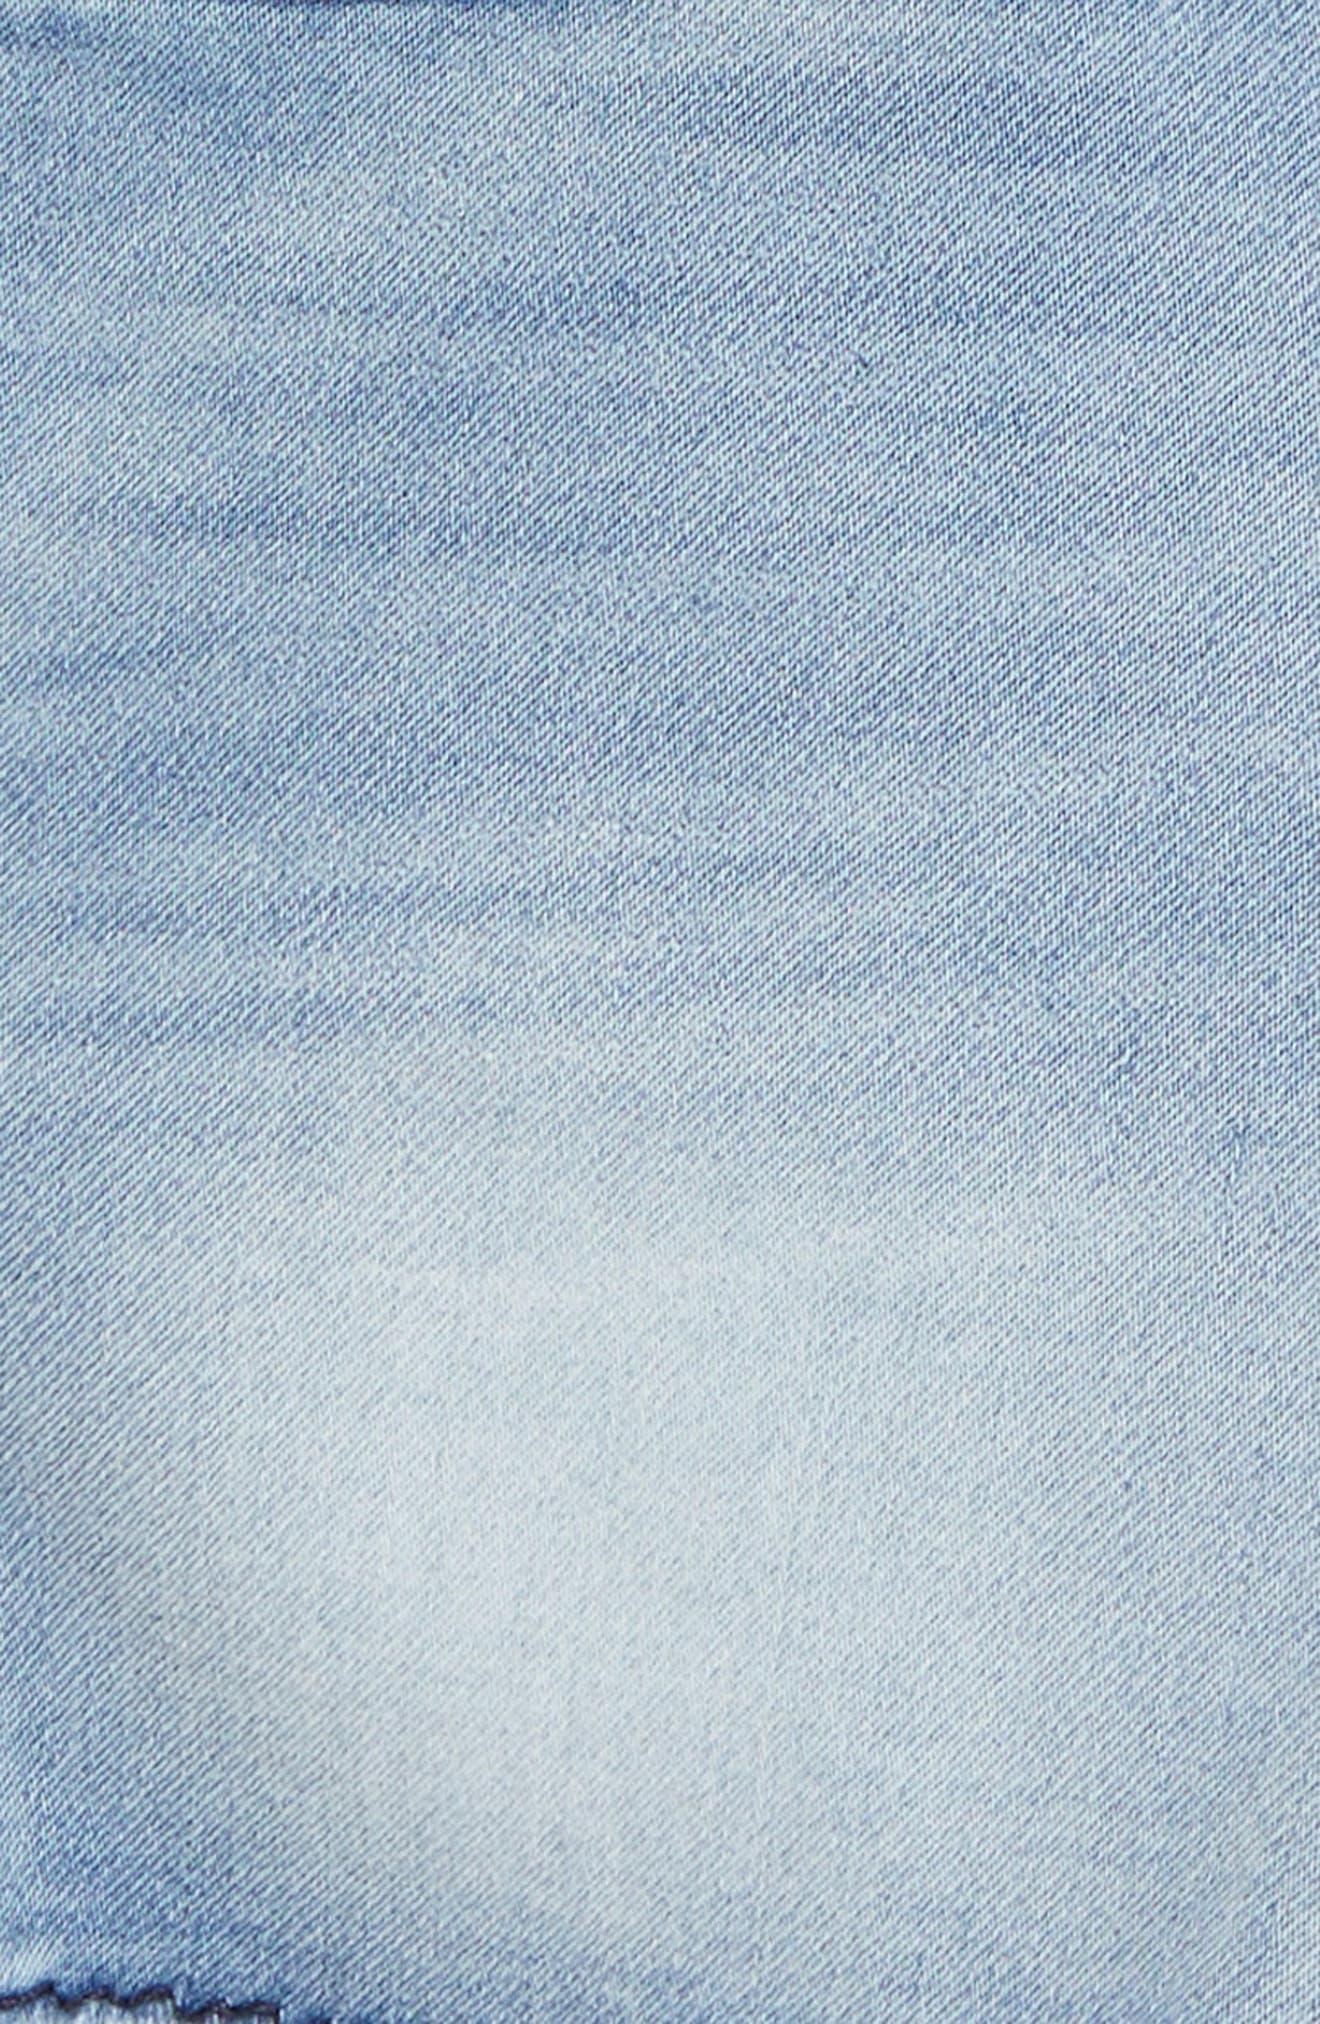 True Religion Geno Denim Shorts,                             Alternate thumbnail 3, color,                             462